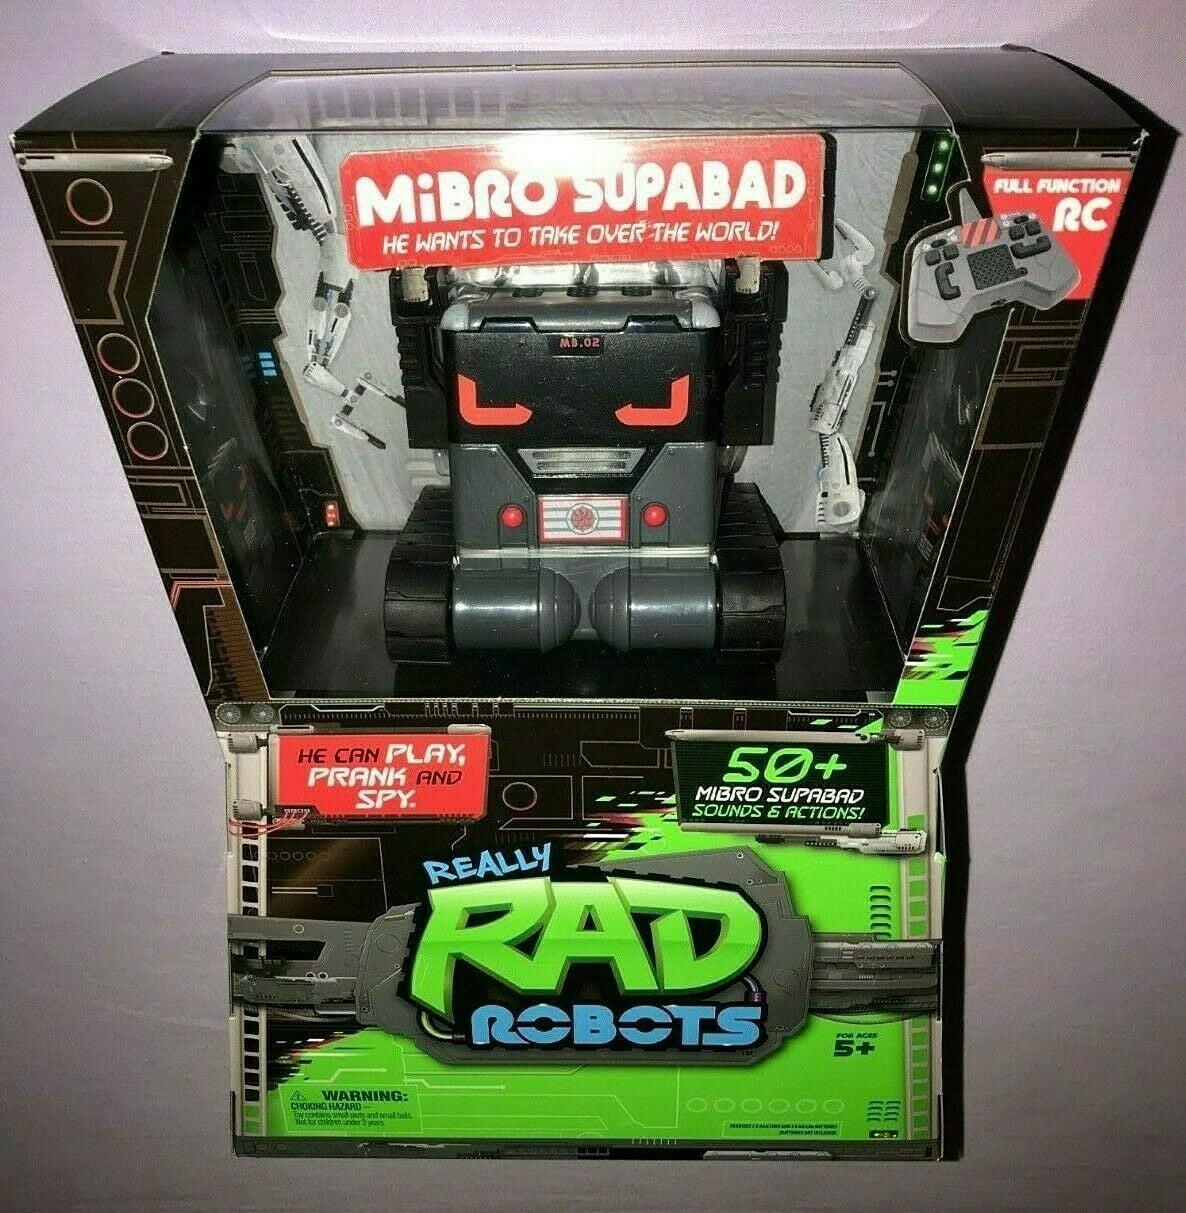 Supabad Really Rad Robots Mibro